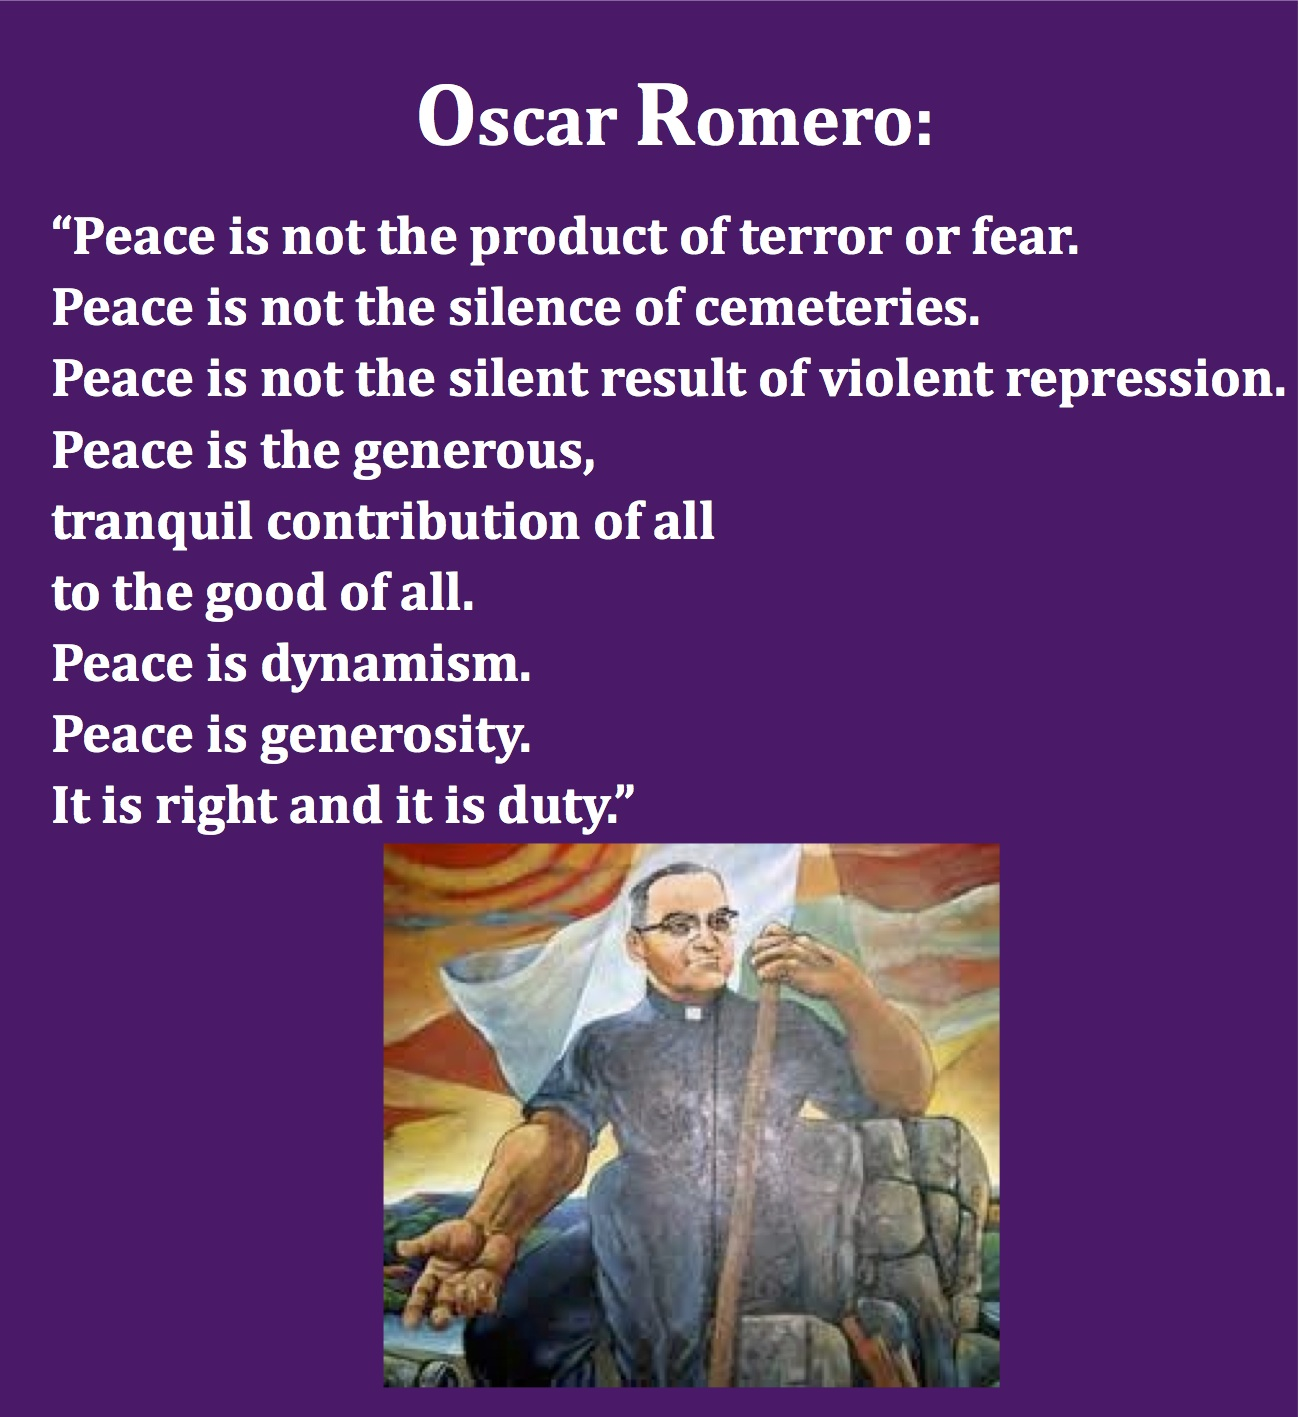 From http://pastordawn.com/2014/03/24/peace-oscar-romero/